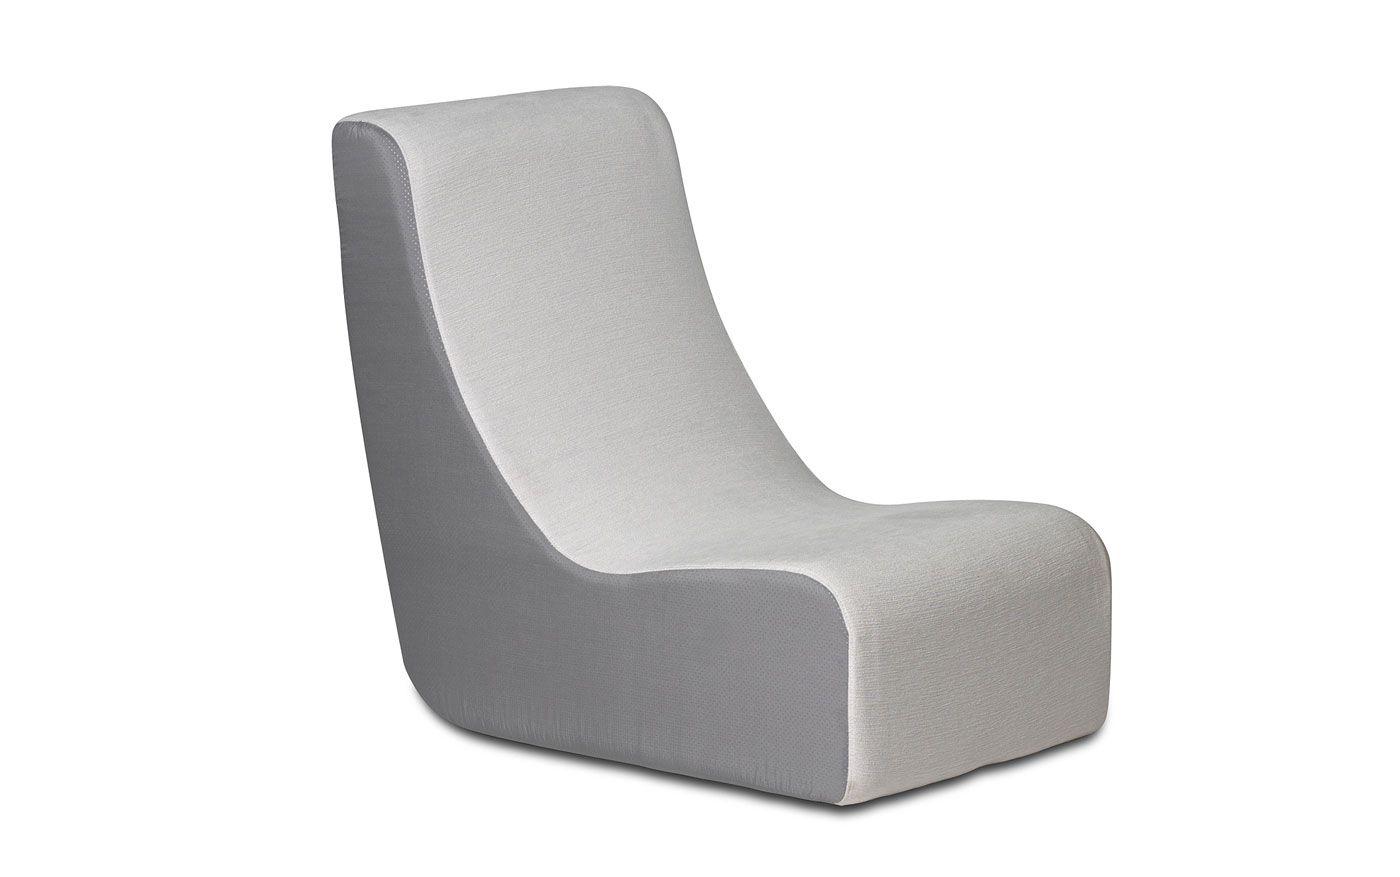 puzzle lounge sessel - möbel / gartenmöbel / gartensitzmöbel - hier